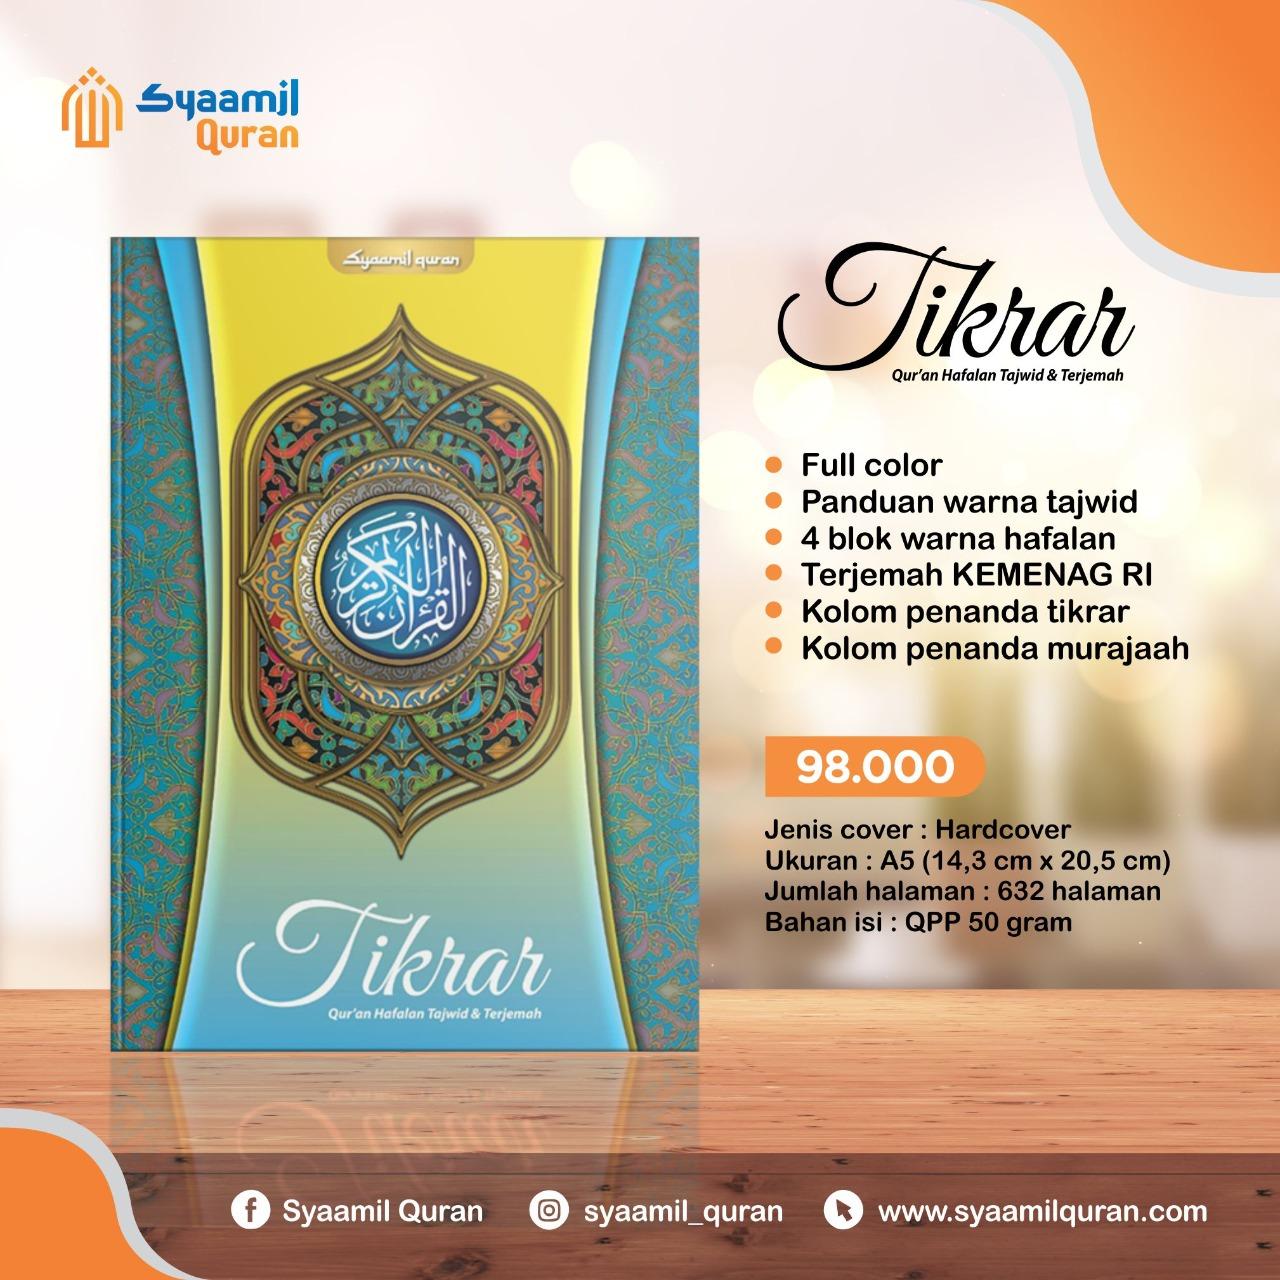 Jual Produk Syaamil Qur'an, Al-Qur'an Tikrar: Qur'an Hafalan Tajwid Dan Terjemah